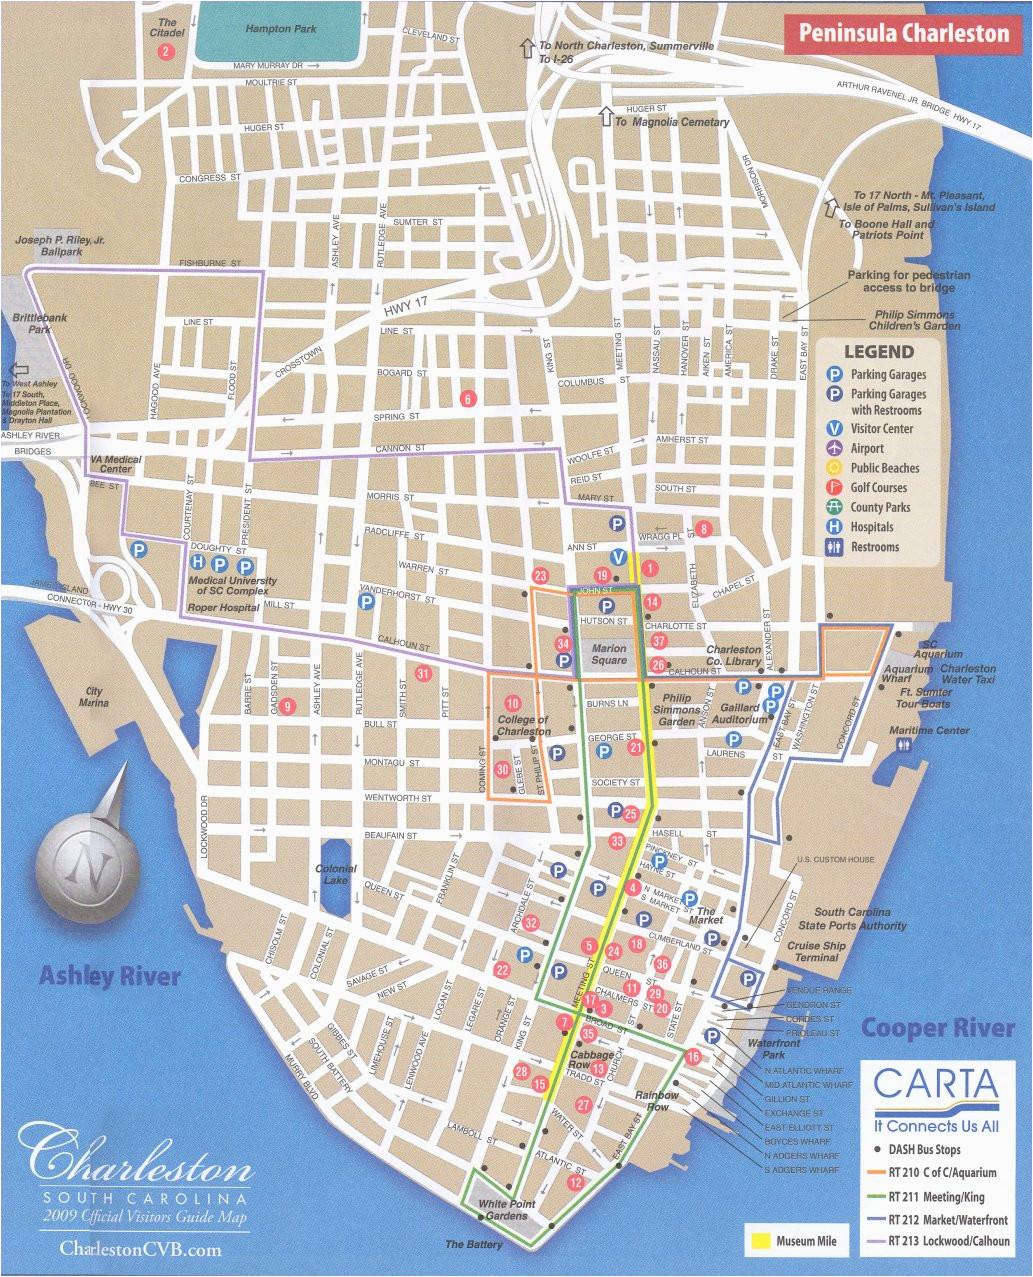 Map Of Downtown Savannah Georgia Map Of Downtown Charleston ... Downtown Savannah Map on